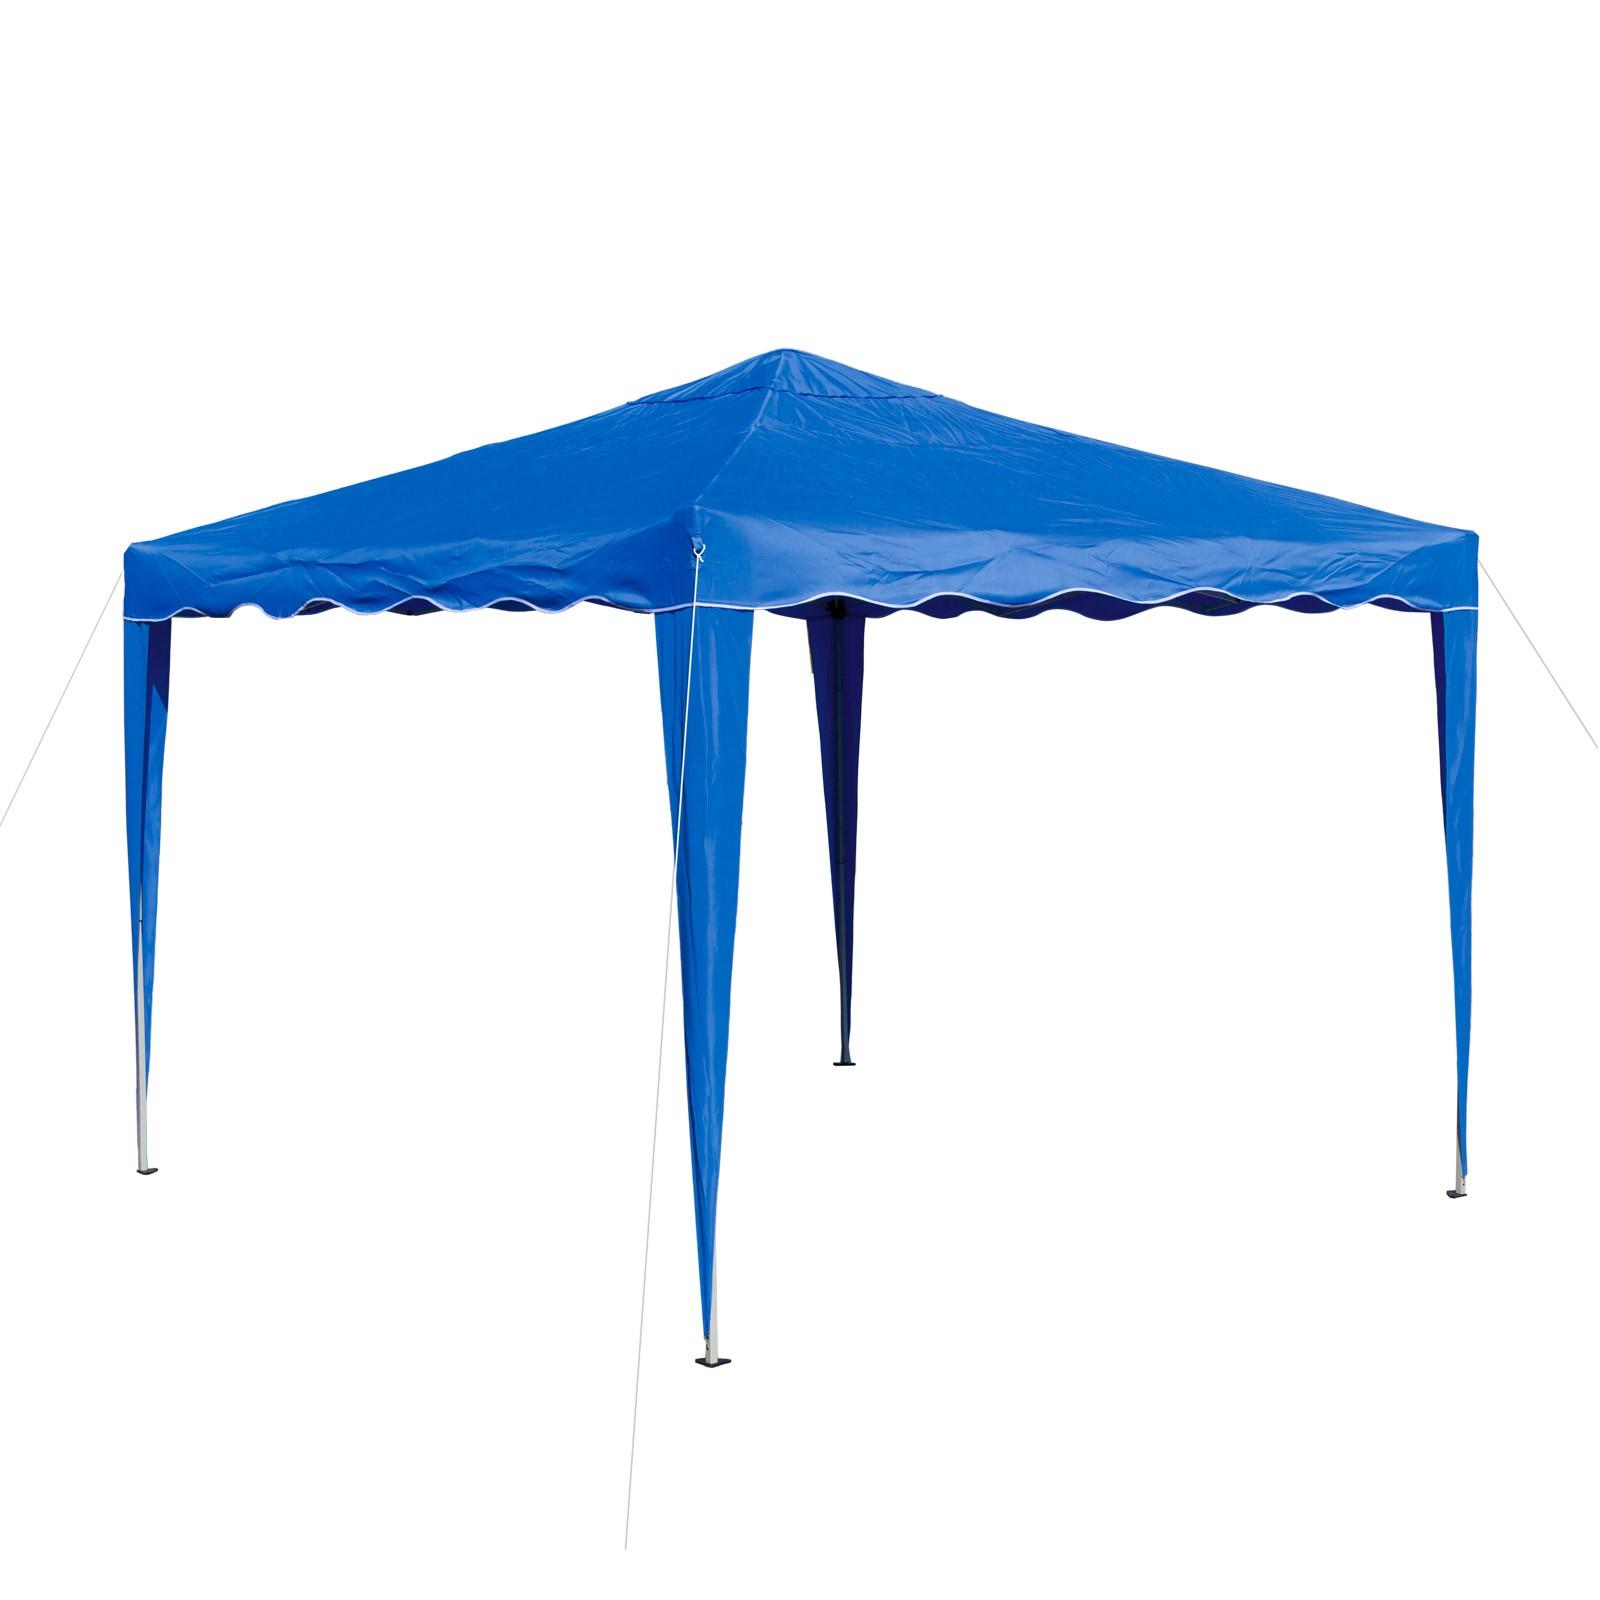 Dema Pavillion Gartenpavillon Faltpavillon Alu/Metall 3x3m hellblau Garten Partyzelt 14215